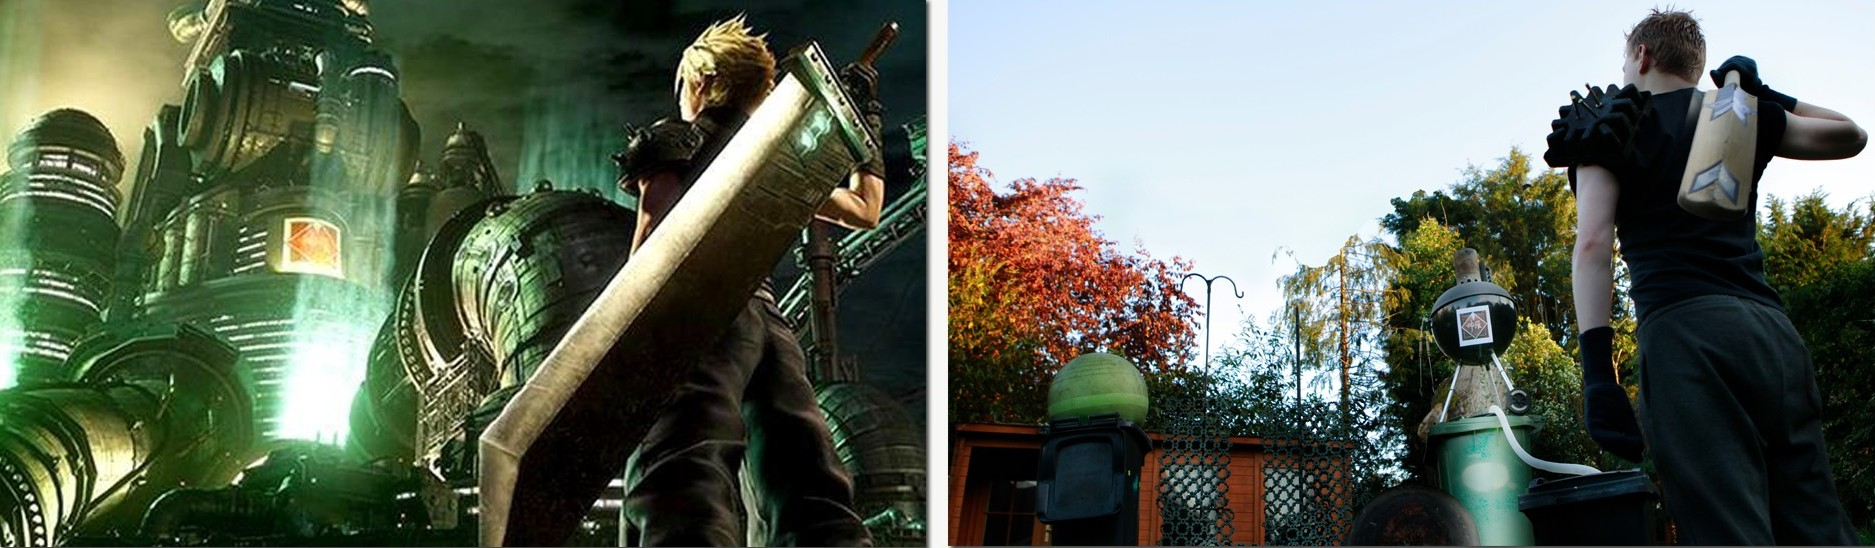 Final Fantasy 7 Remake / Bin Night Fantasy Original